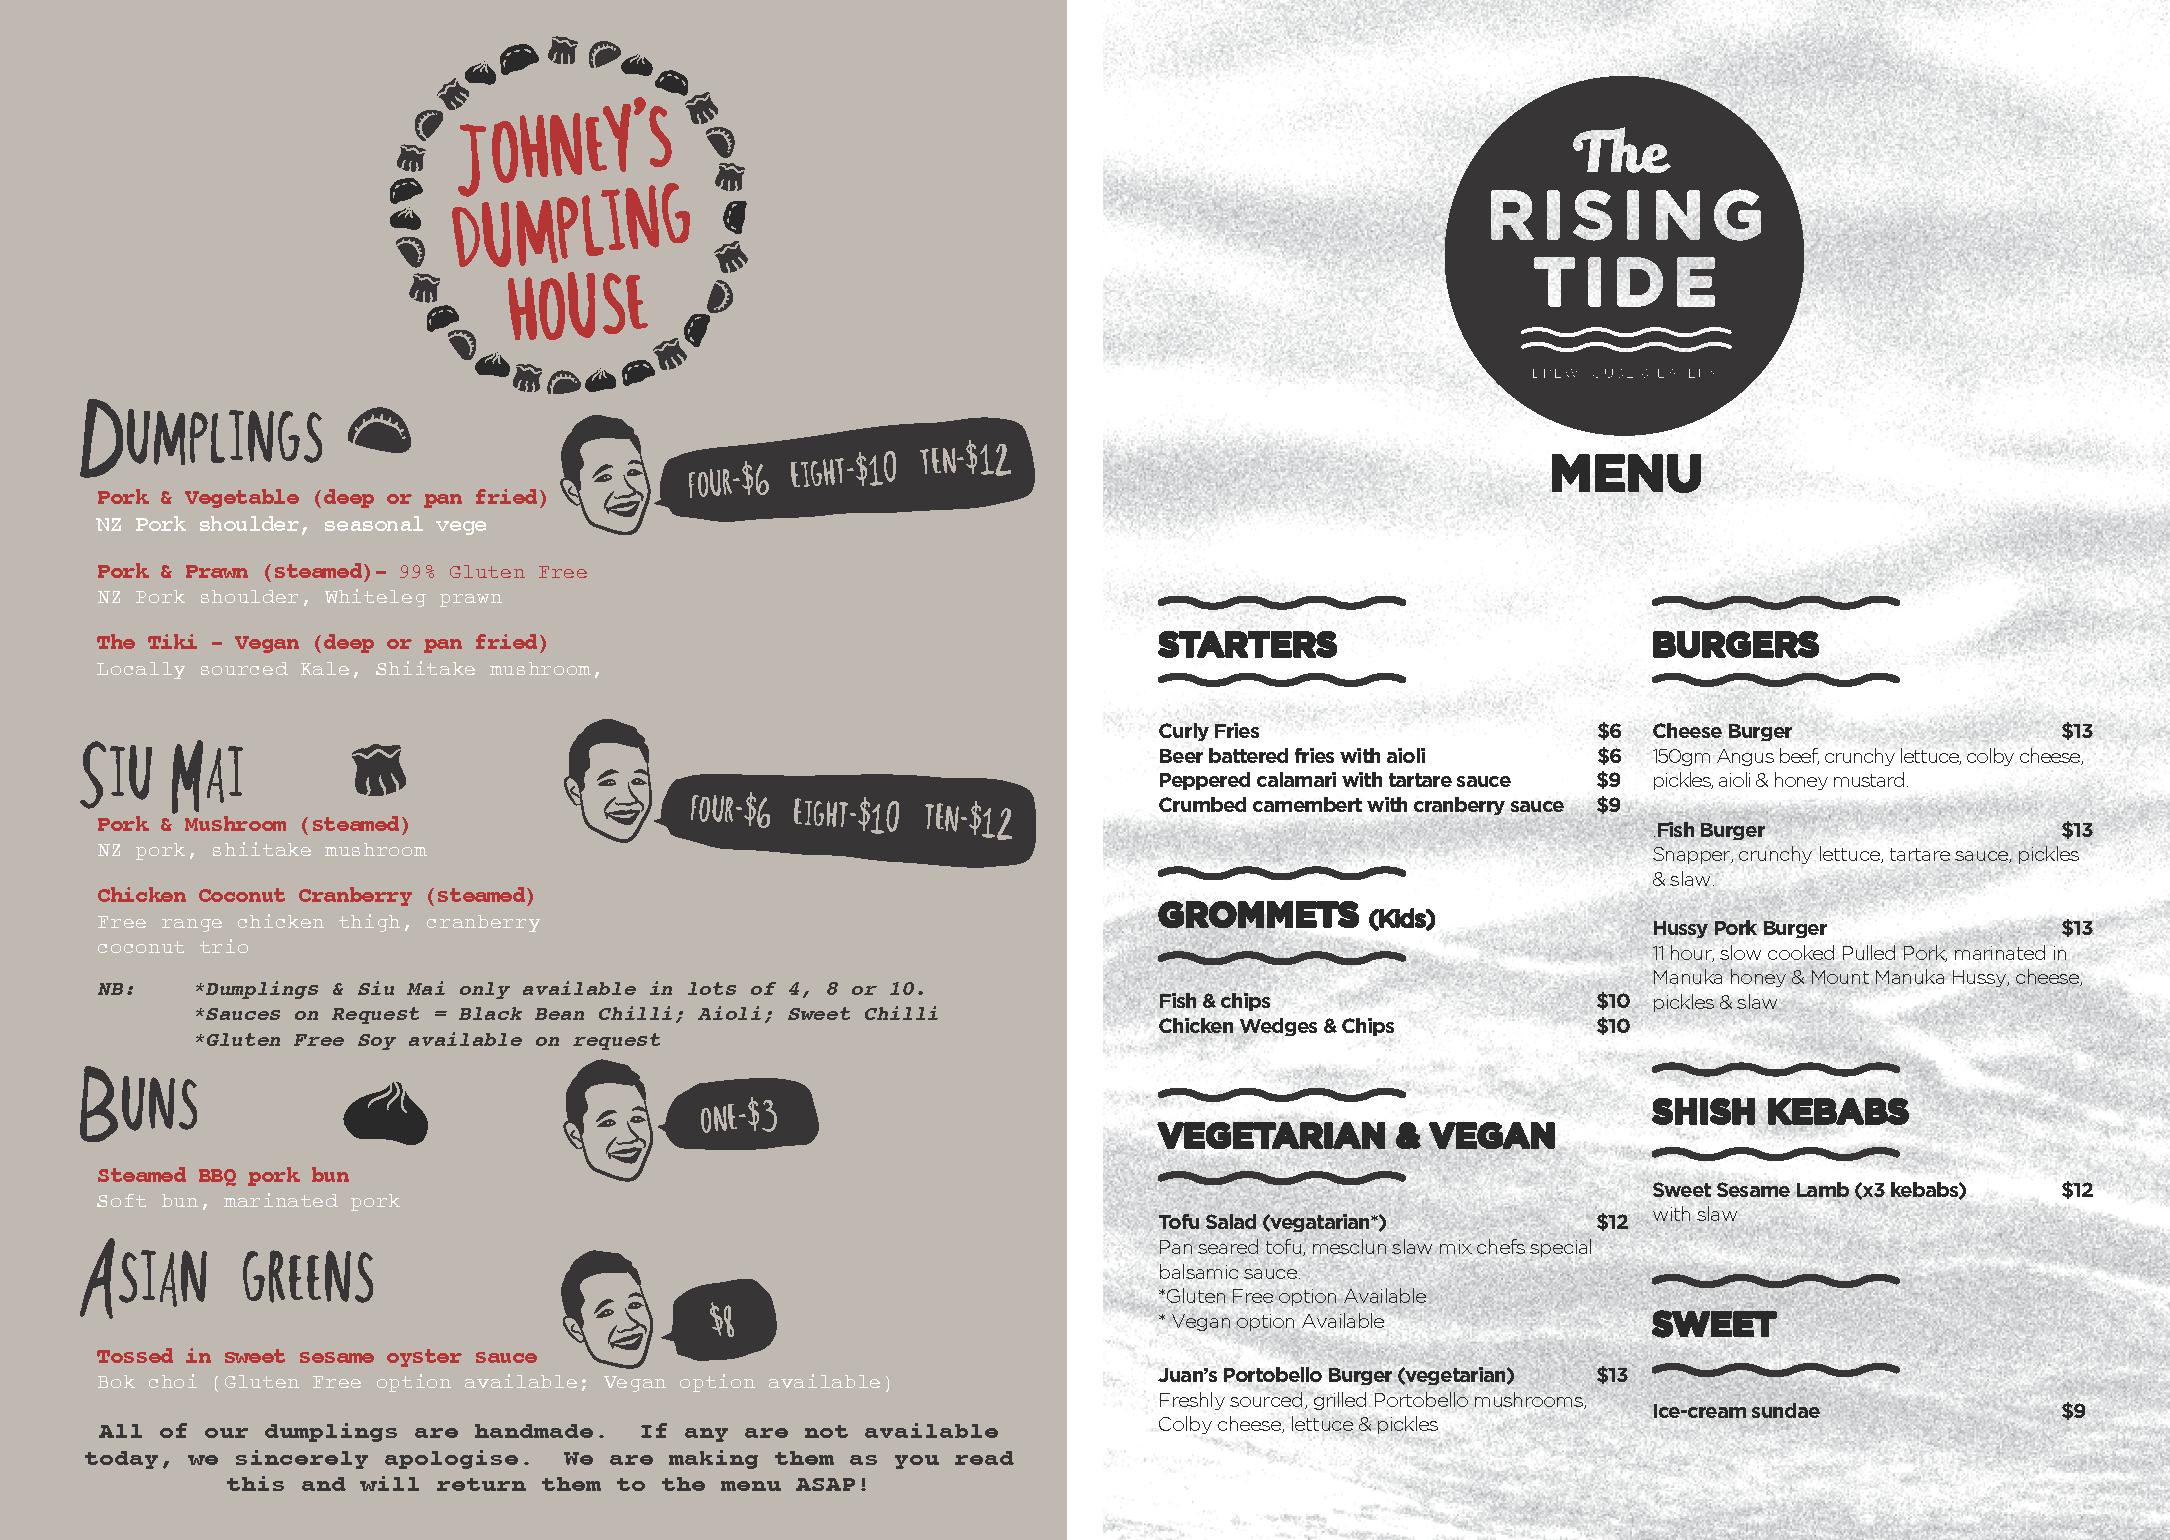 TheRisingTide menu.png